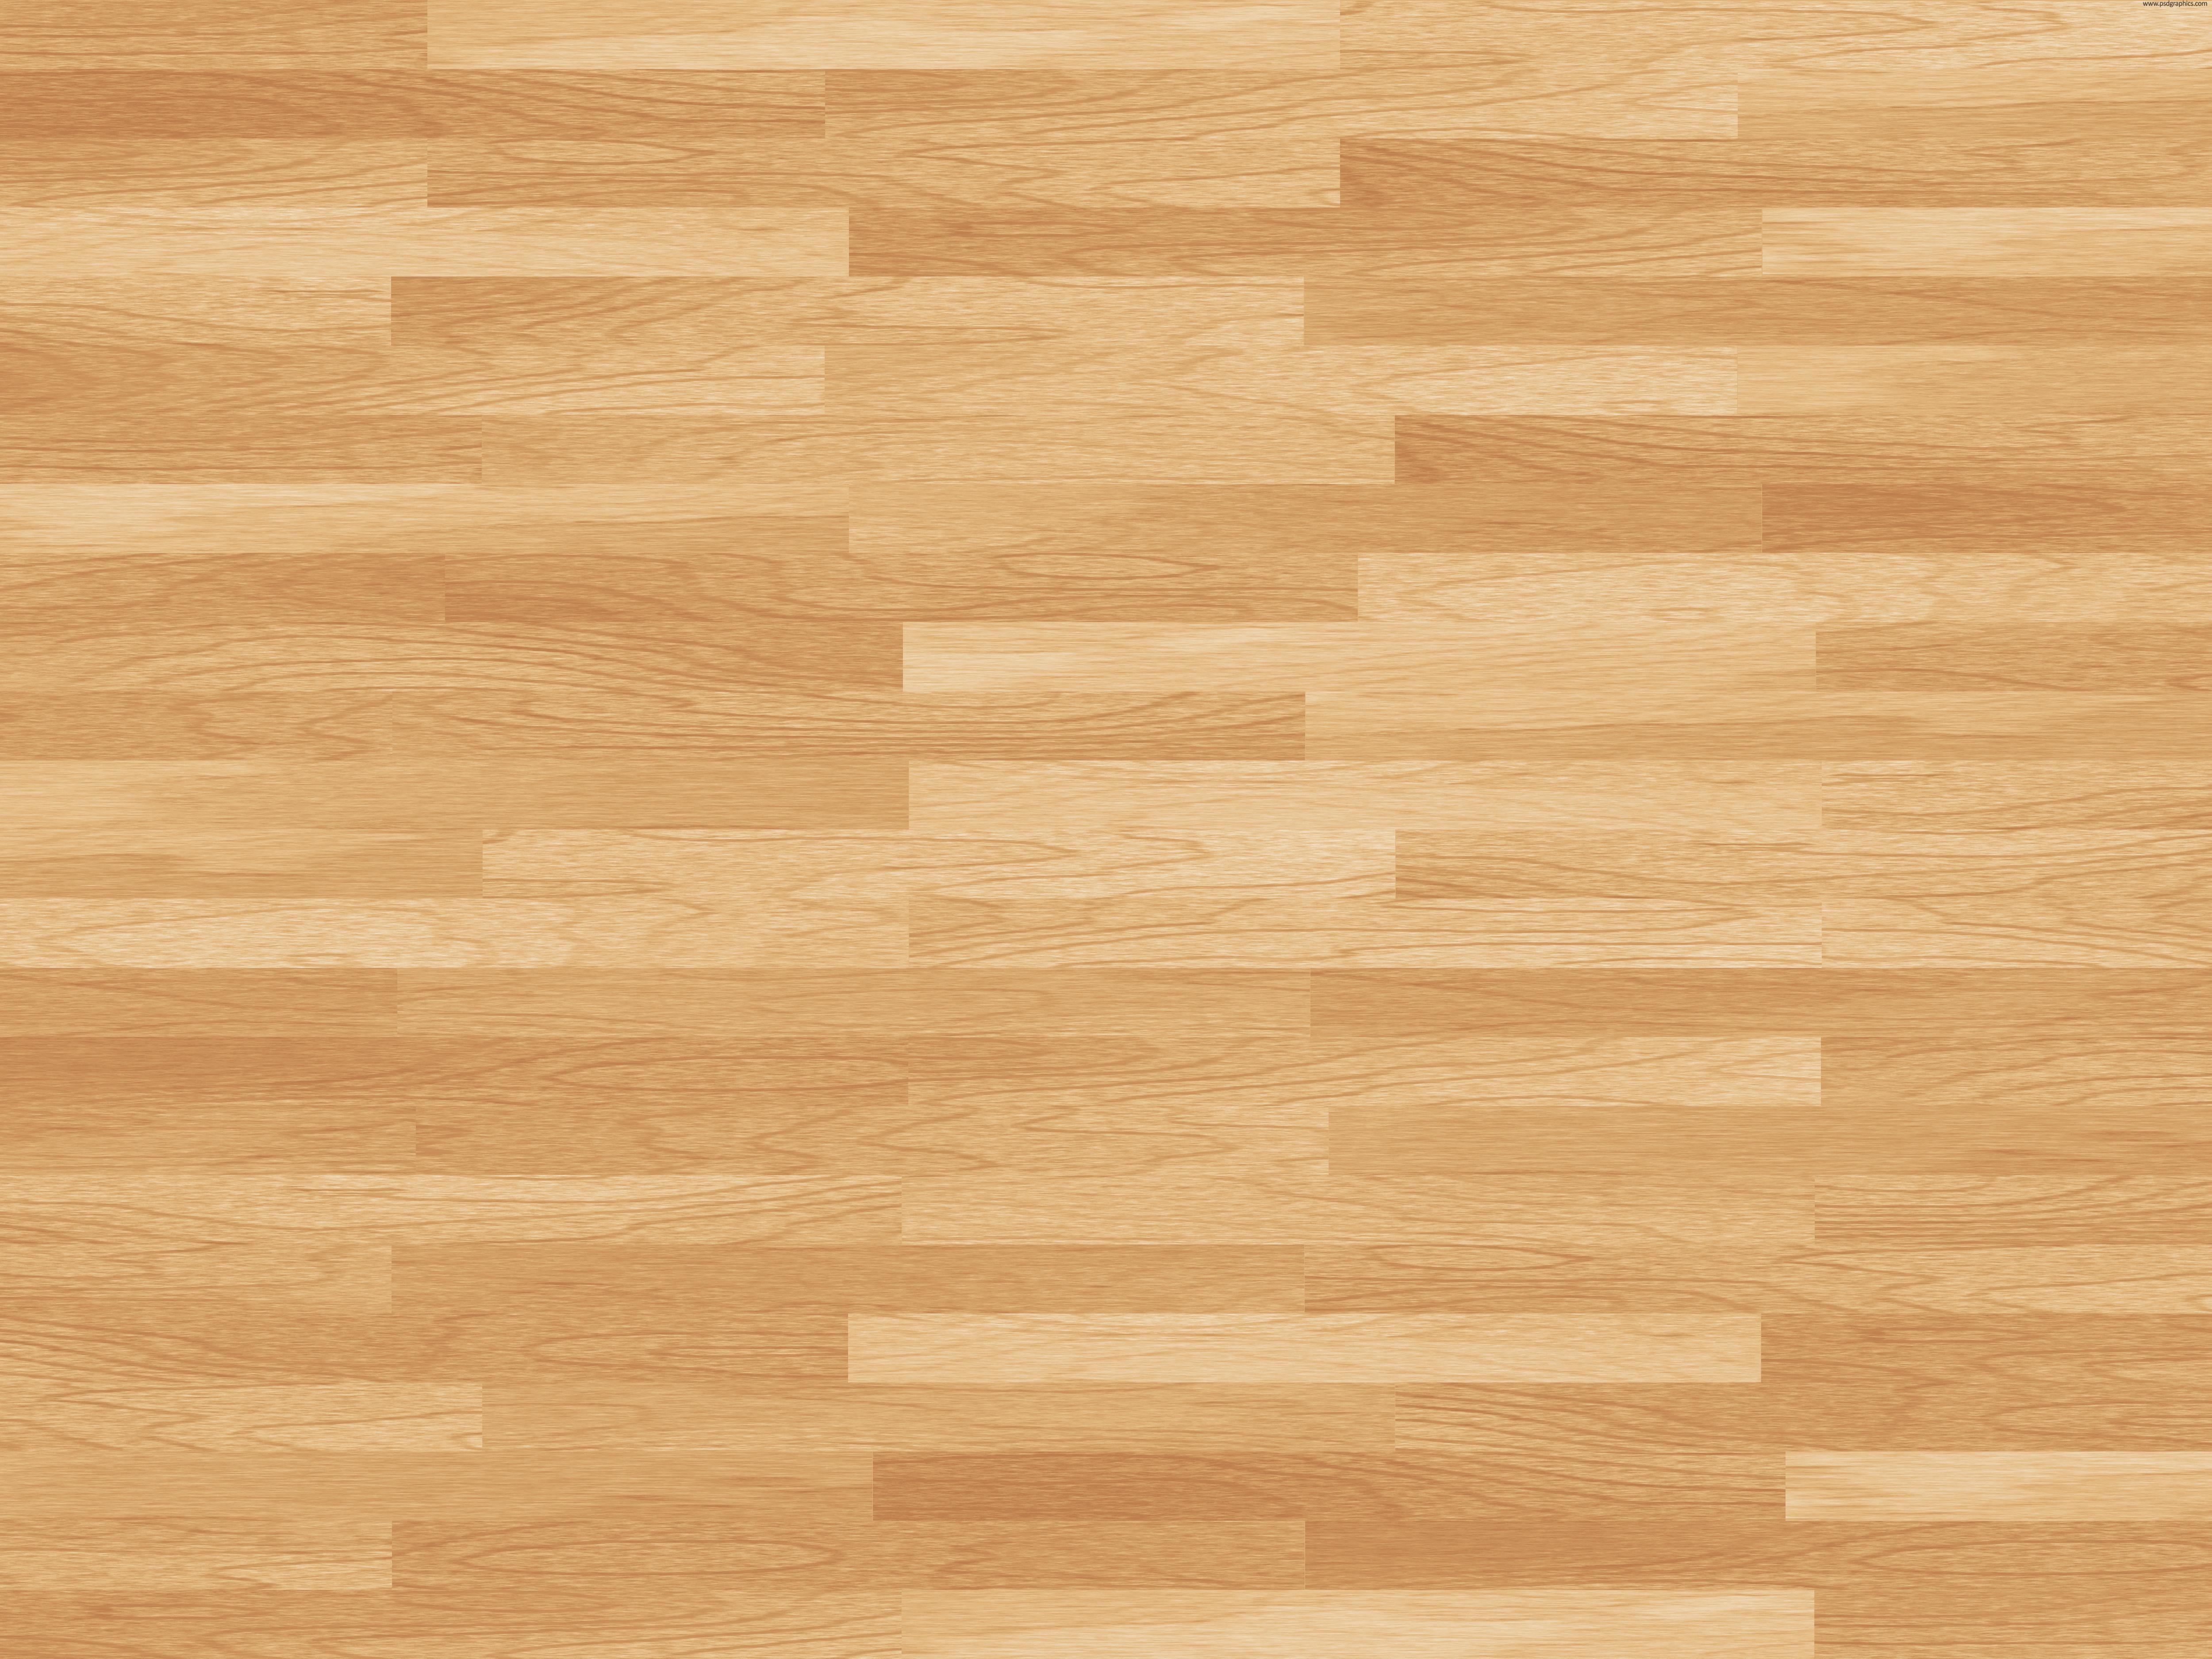 hardwood flooring texture WDKGVFZ